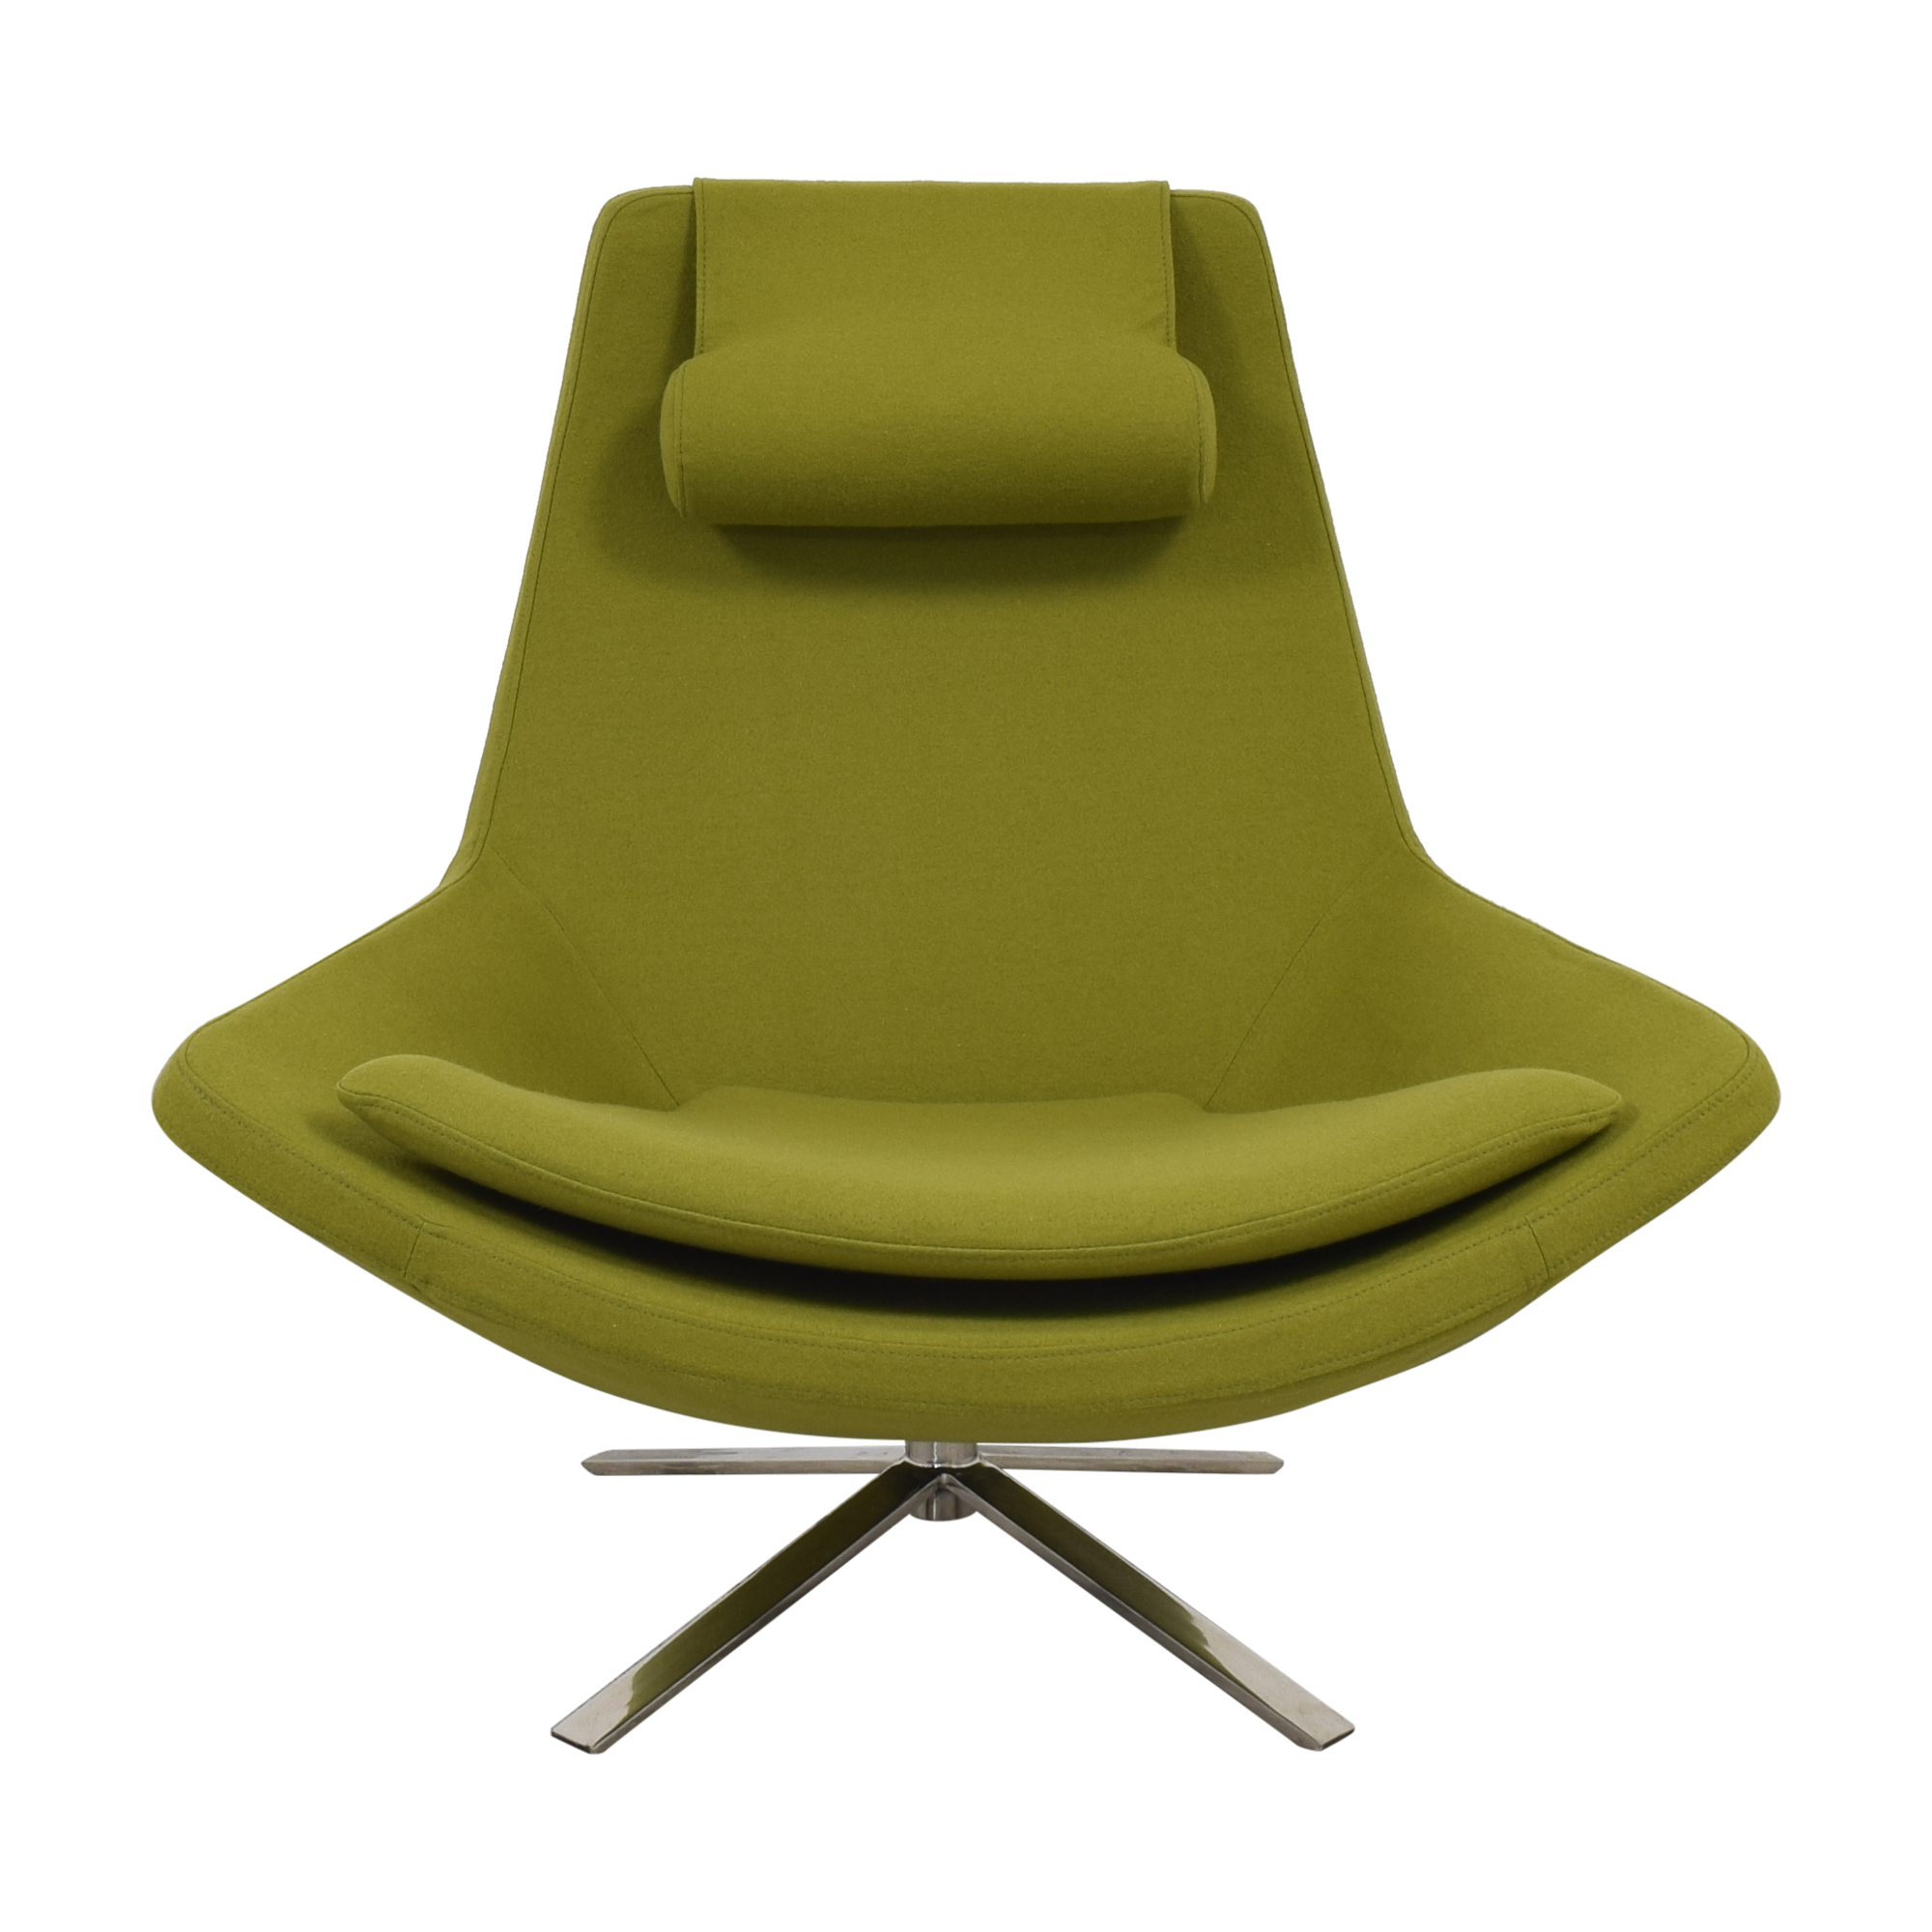 Kardiel Kardiel Retropolitan Chair on sale